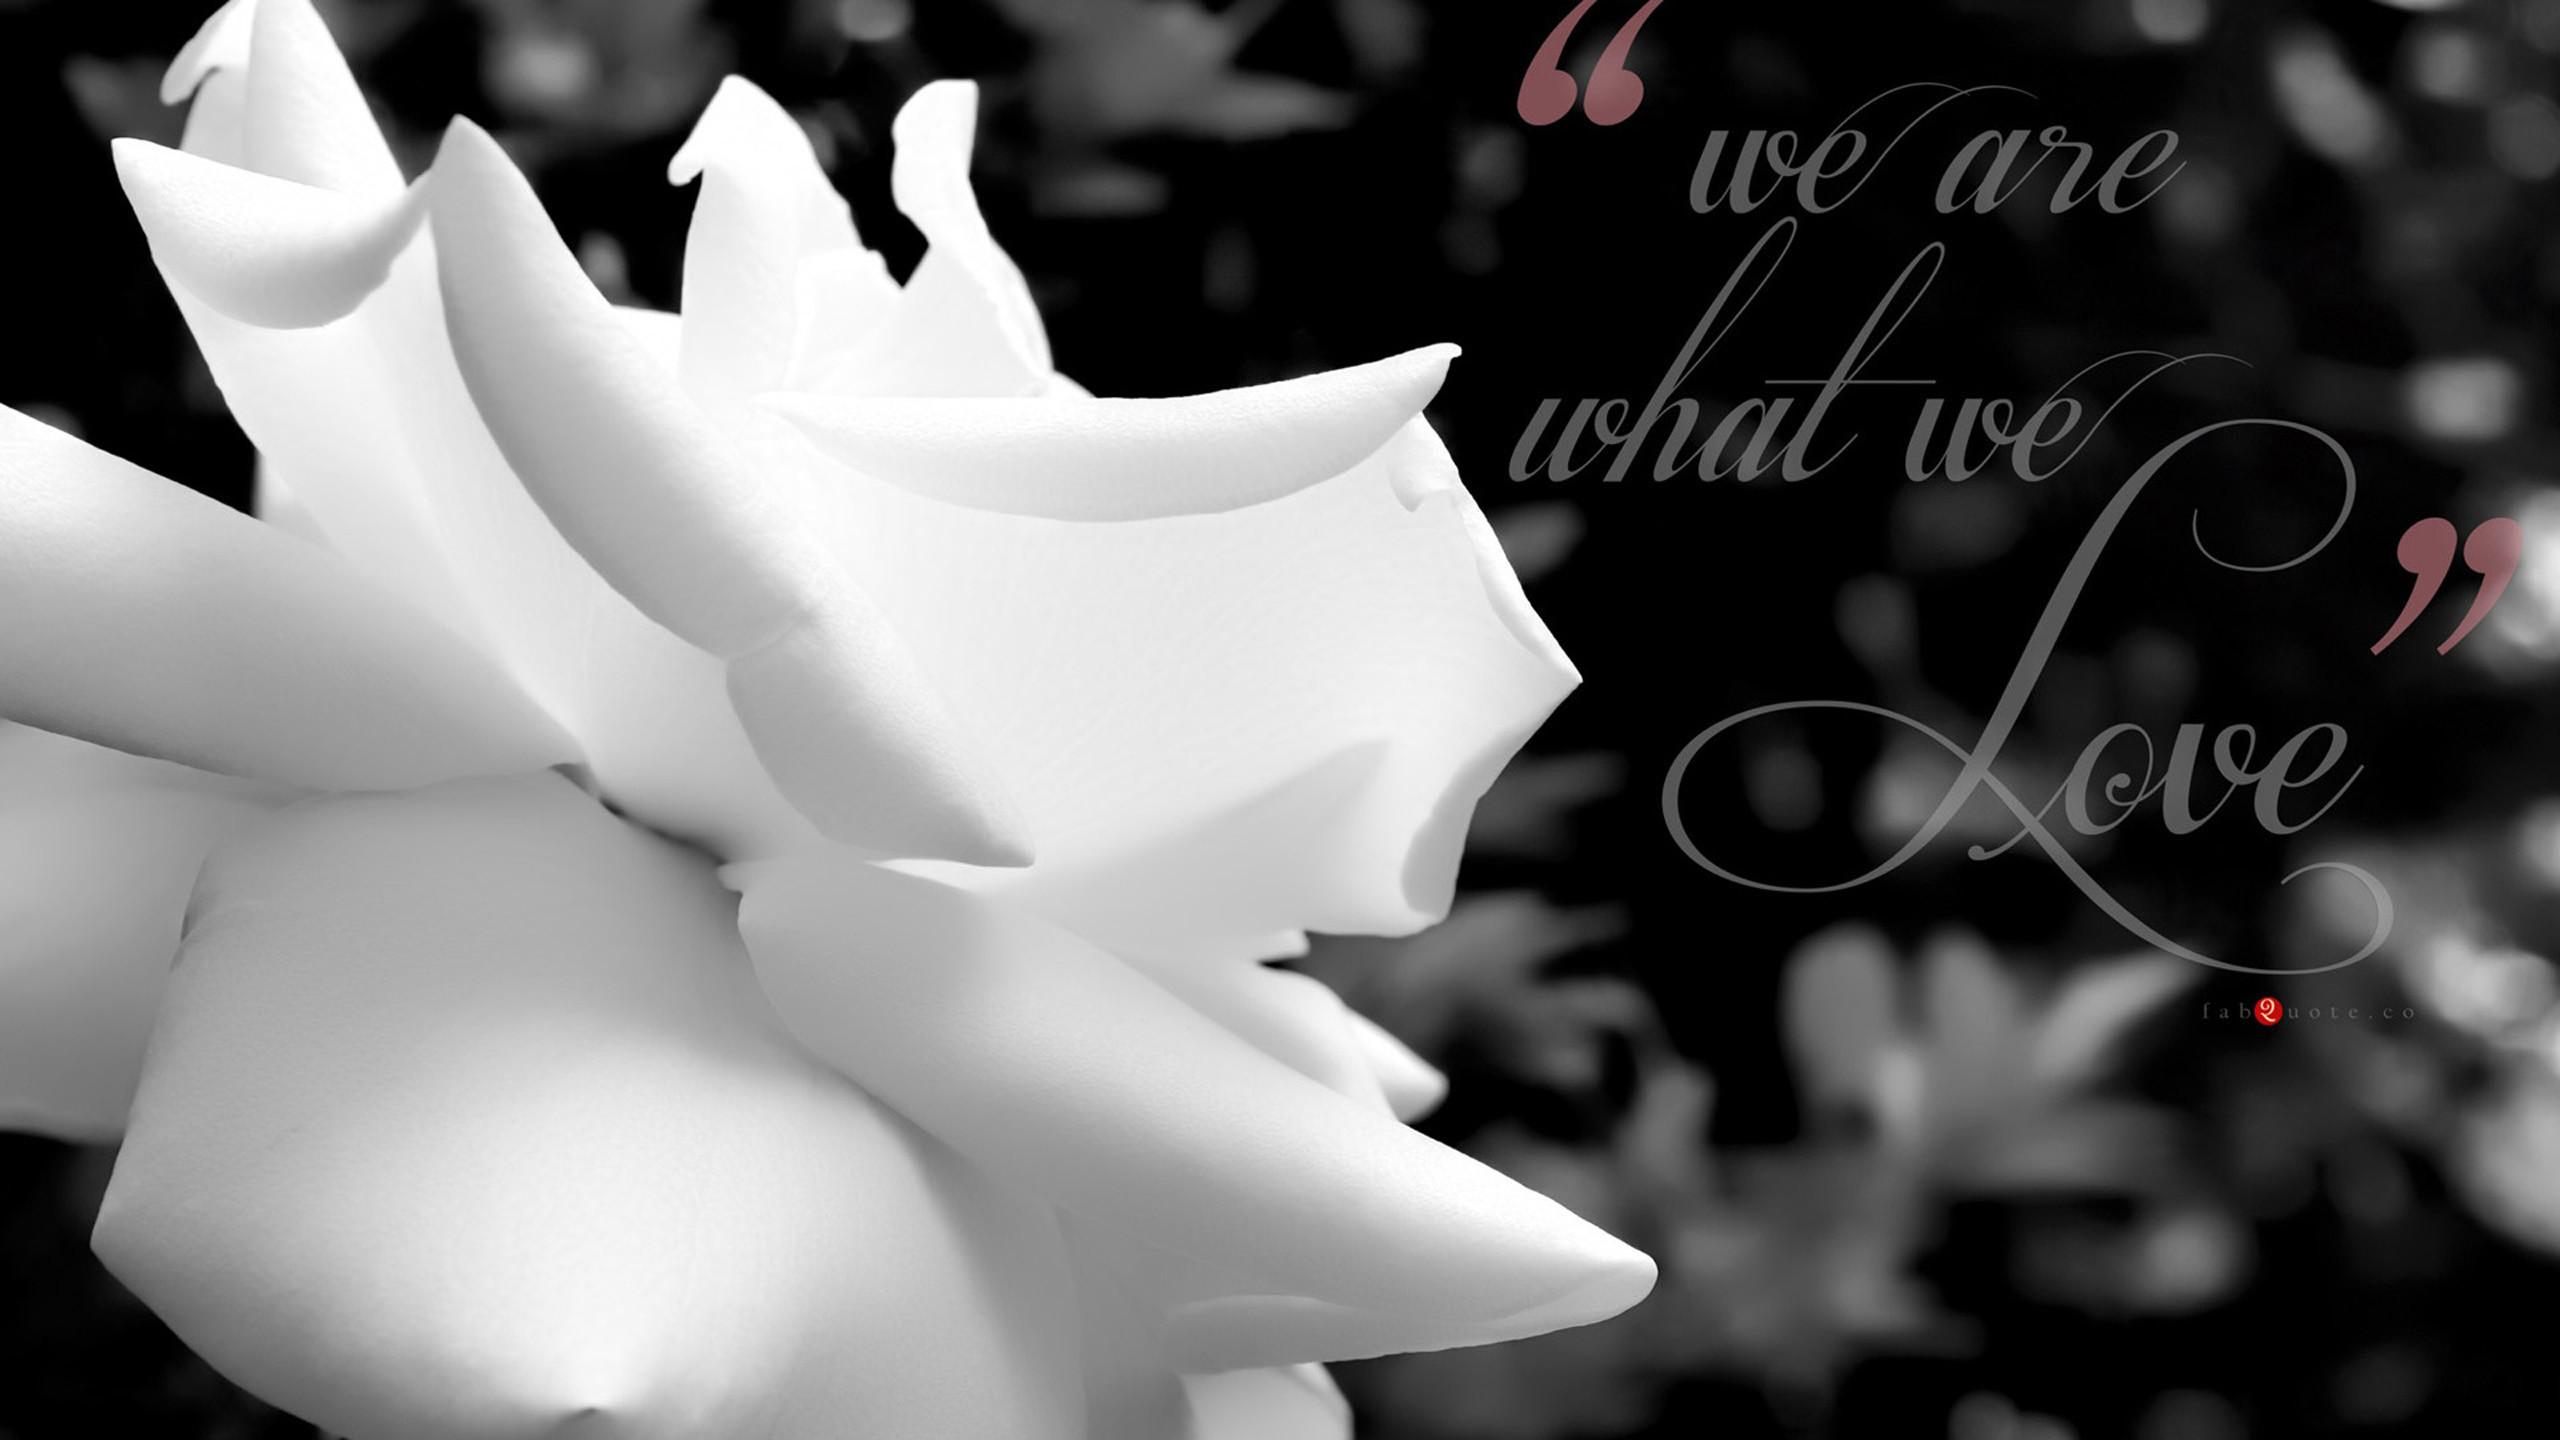 Black And White Rose Wallpaper 7 Widescreen Wallpaper